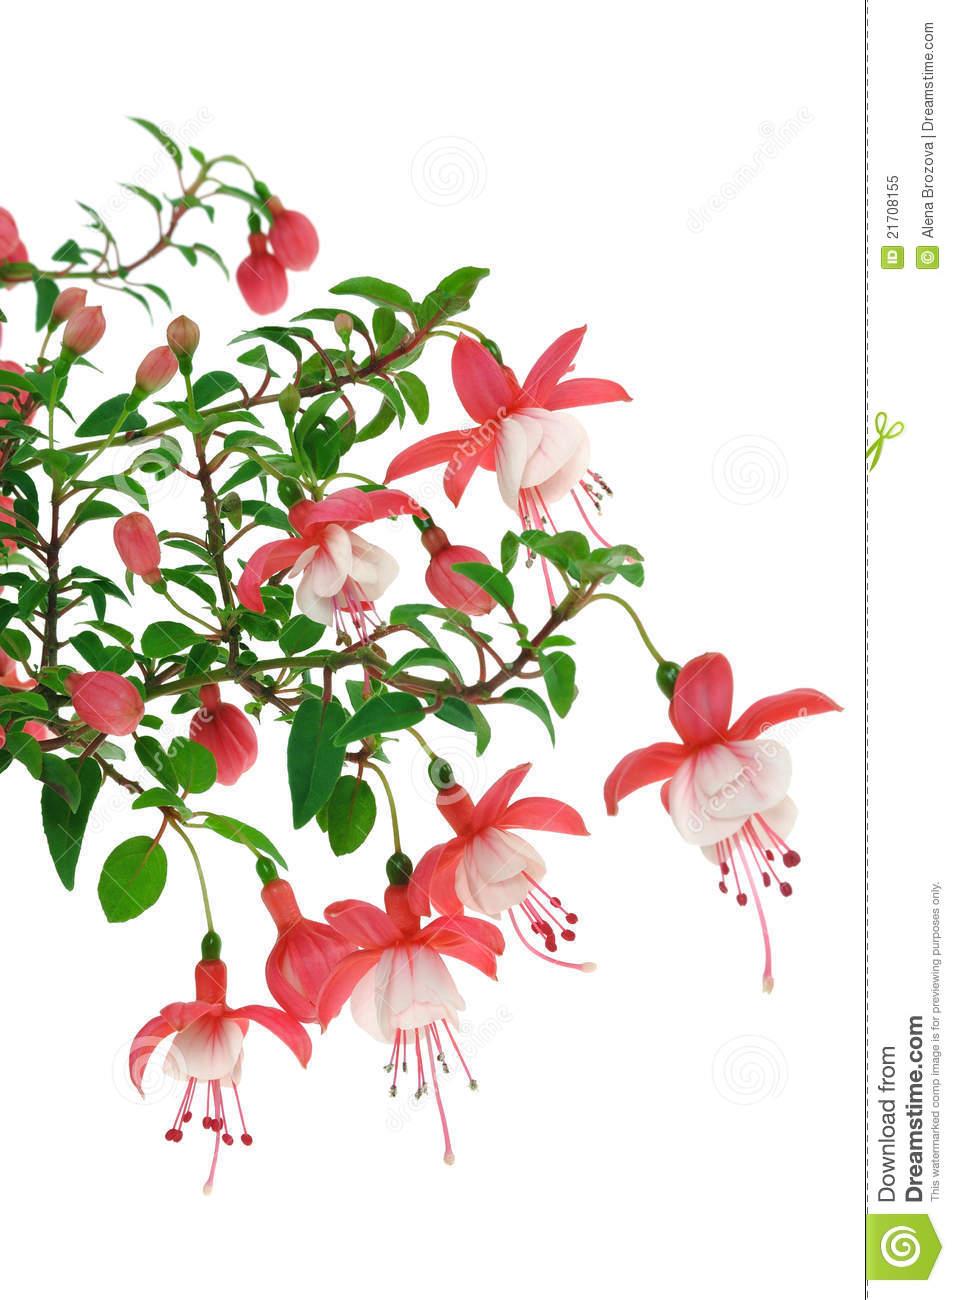 Fuchsia Flowers Over White Background Royalty Free Stock Photo.